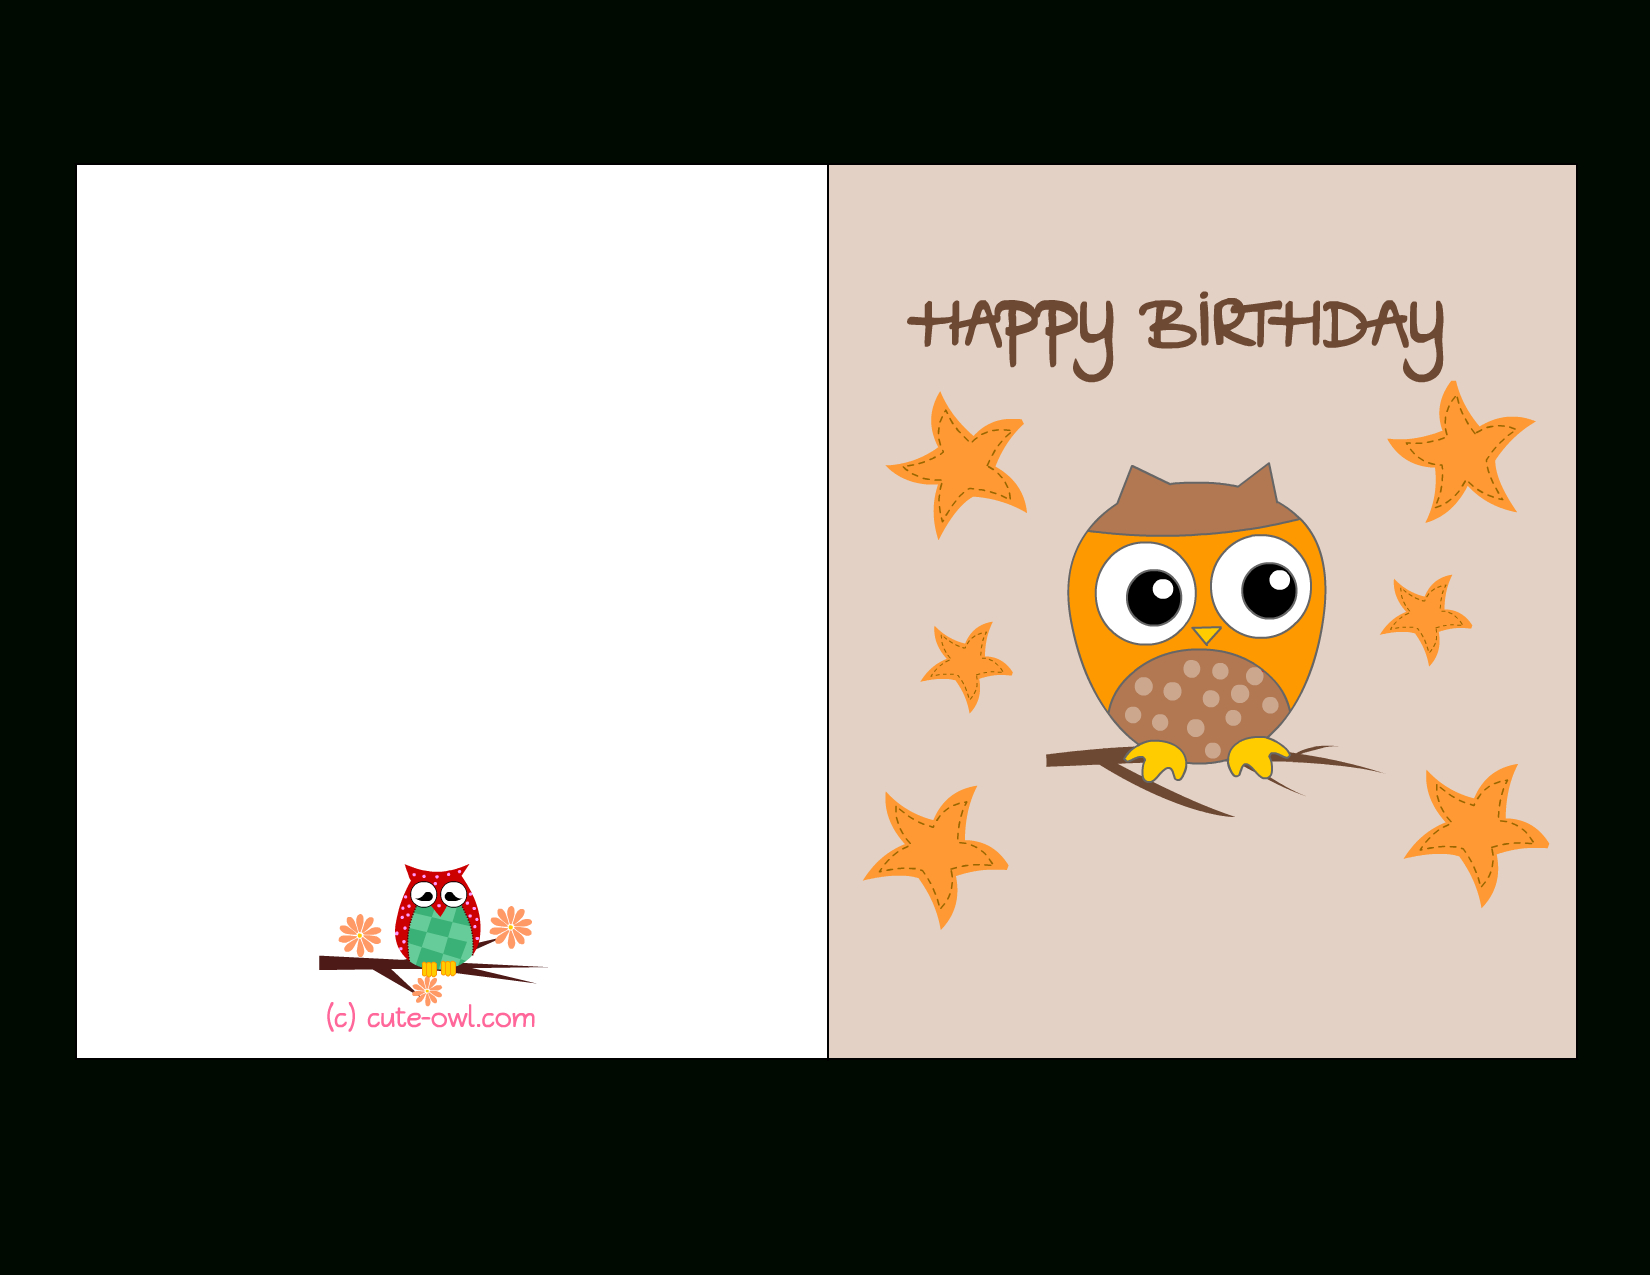 Free Printable Cute Owl Birthday Cards - Free Printable Bday Cards